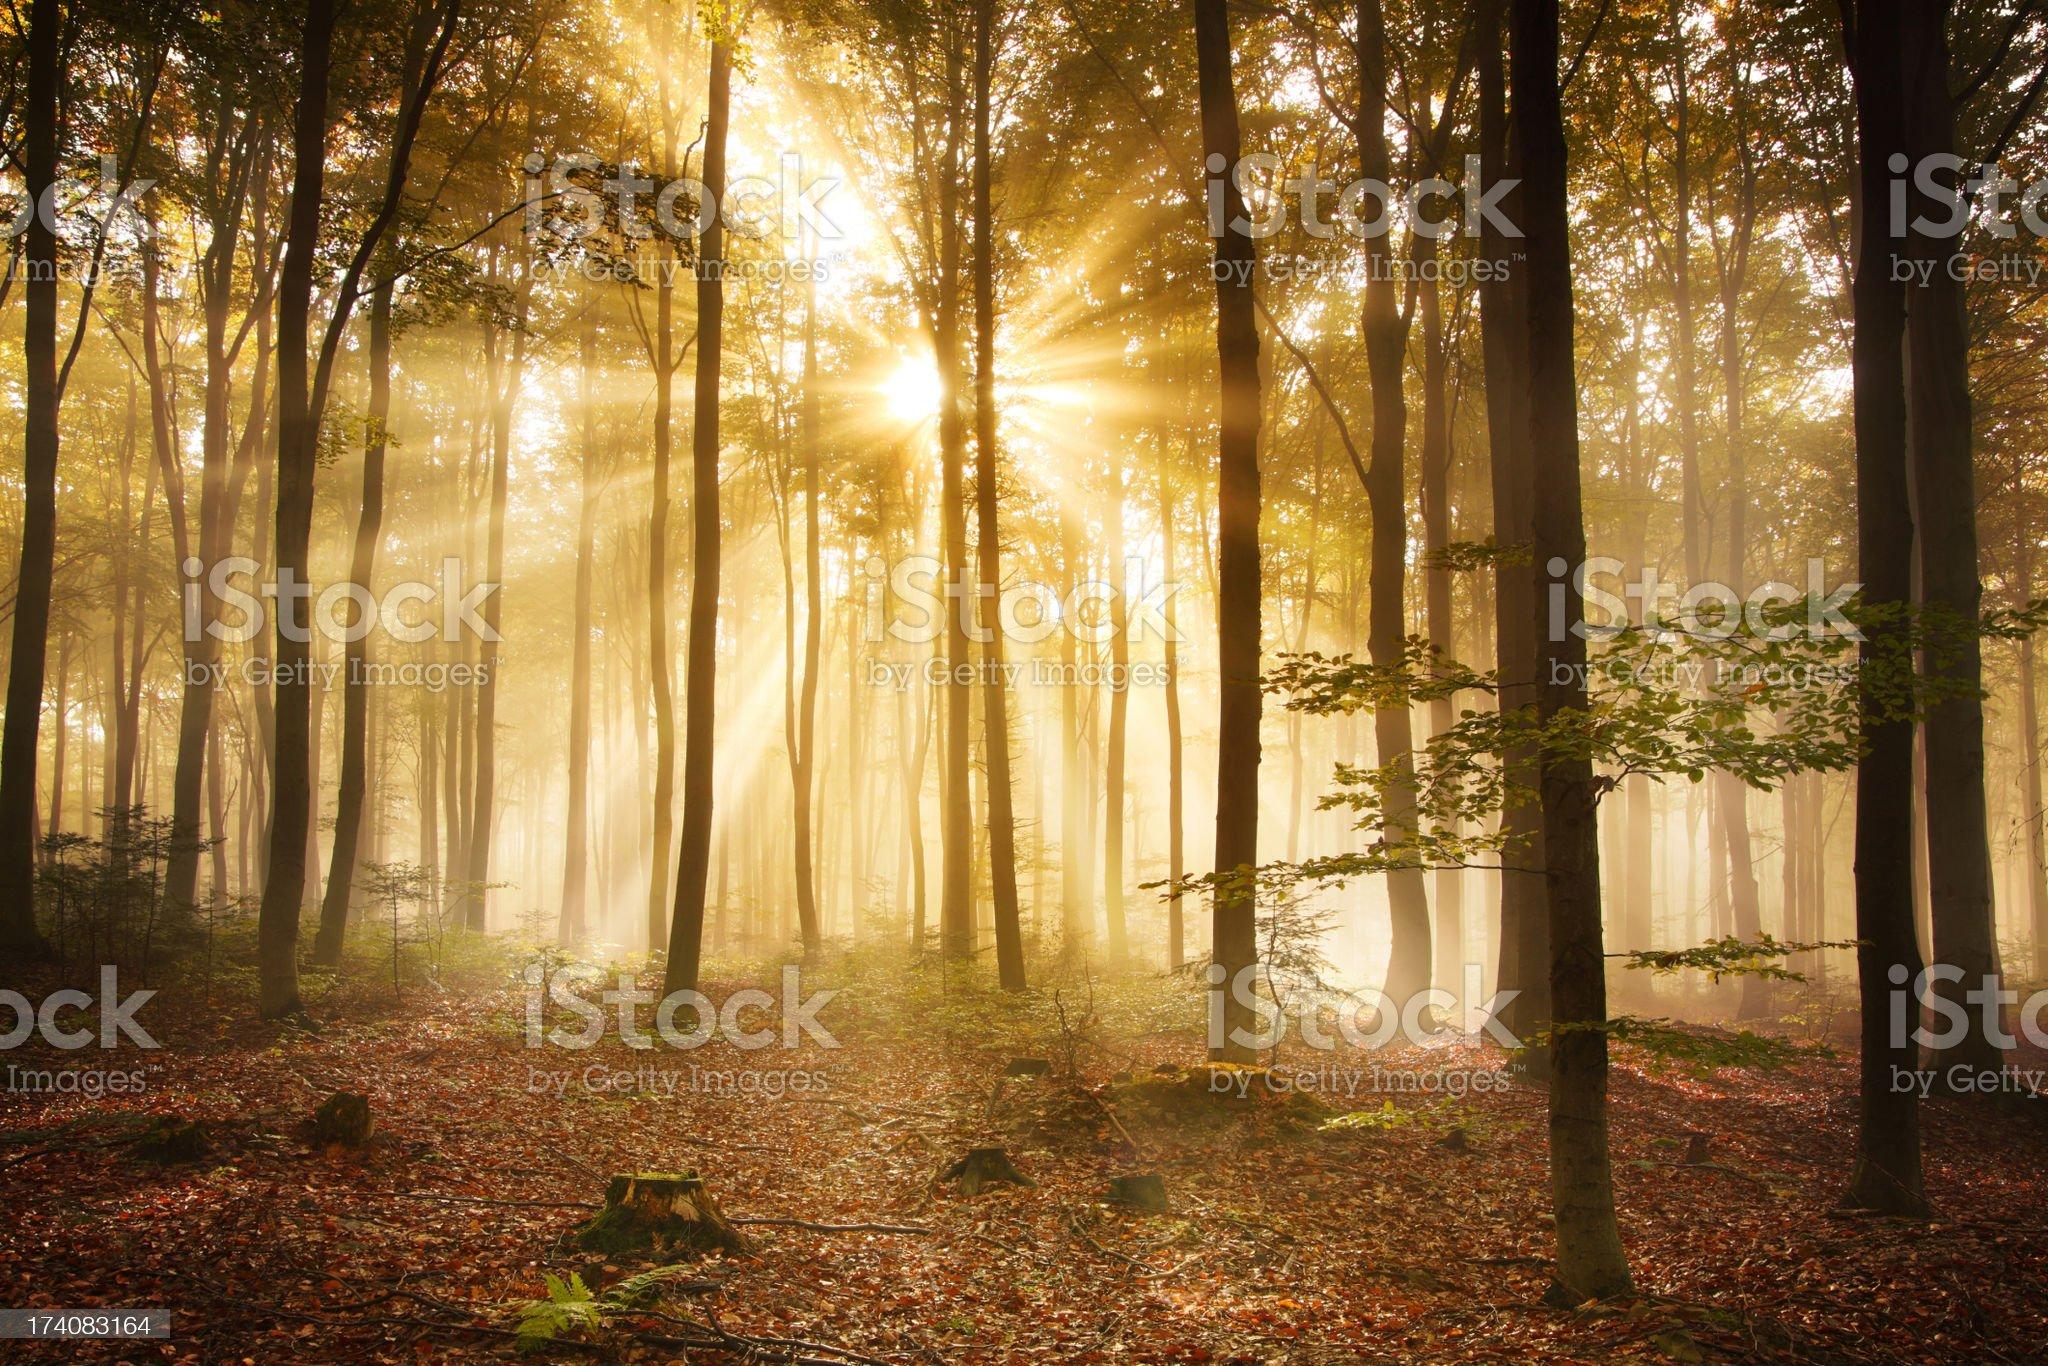 Foggy Autumn Forest - HDR XXXL Image royalty-free stock photo